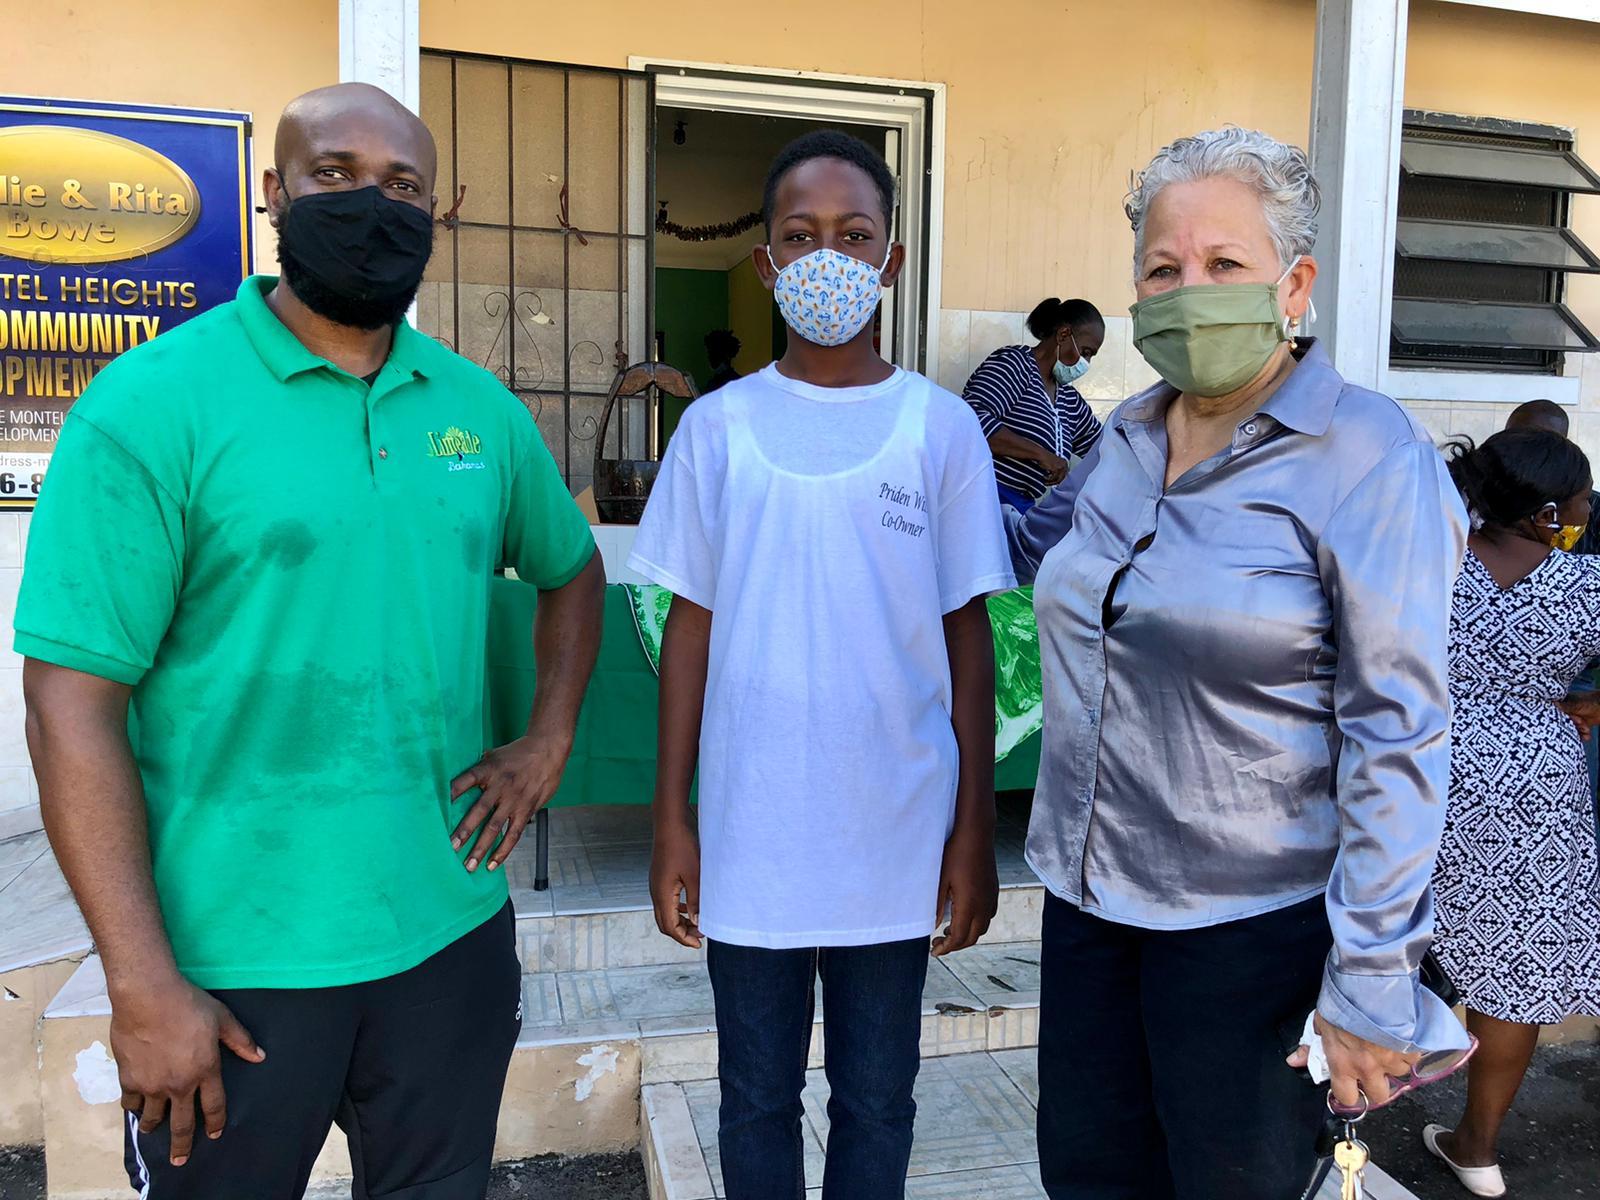 Limeade Bahamas provides breakfast for 400 in the Englerston community